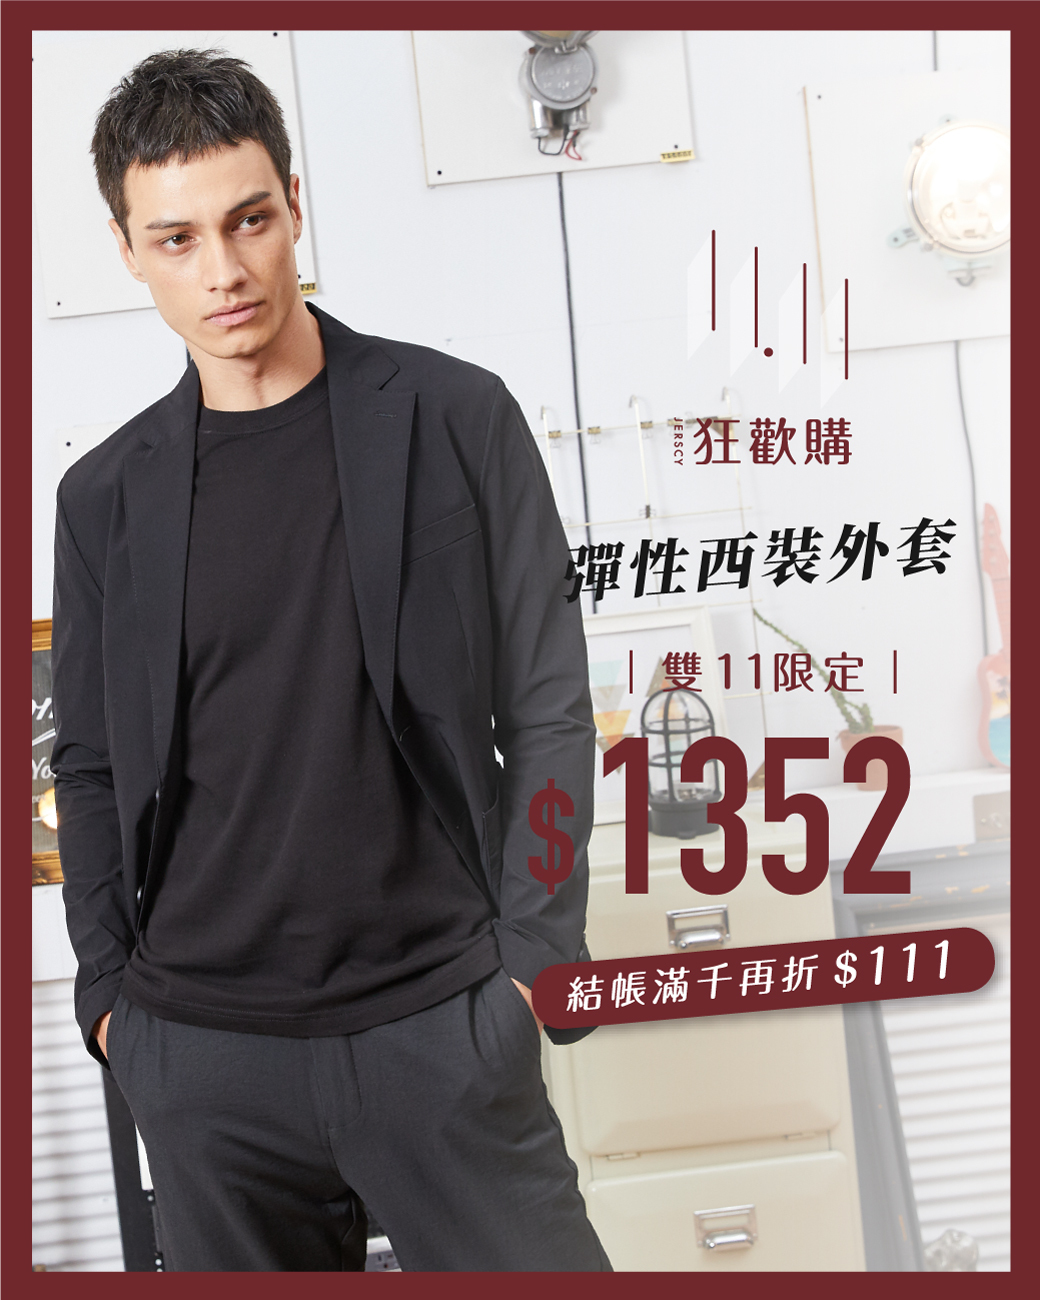 jerscy,最新商品,彈力西裝外套